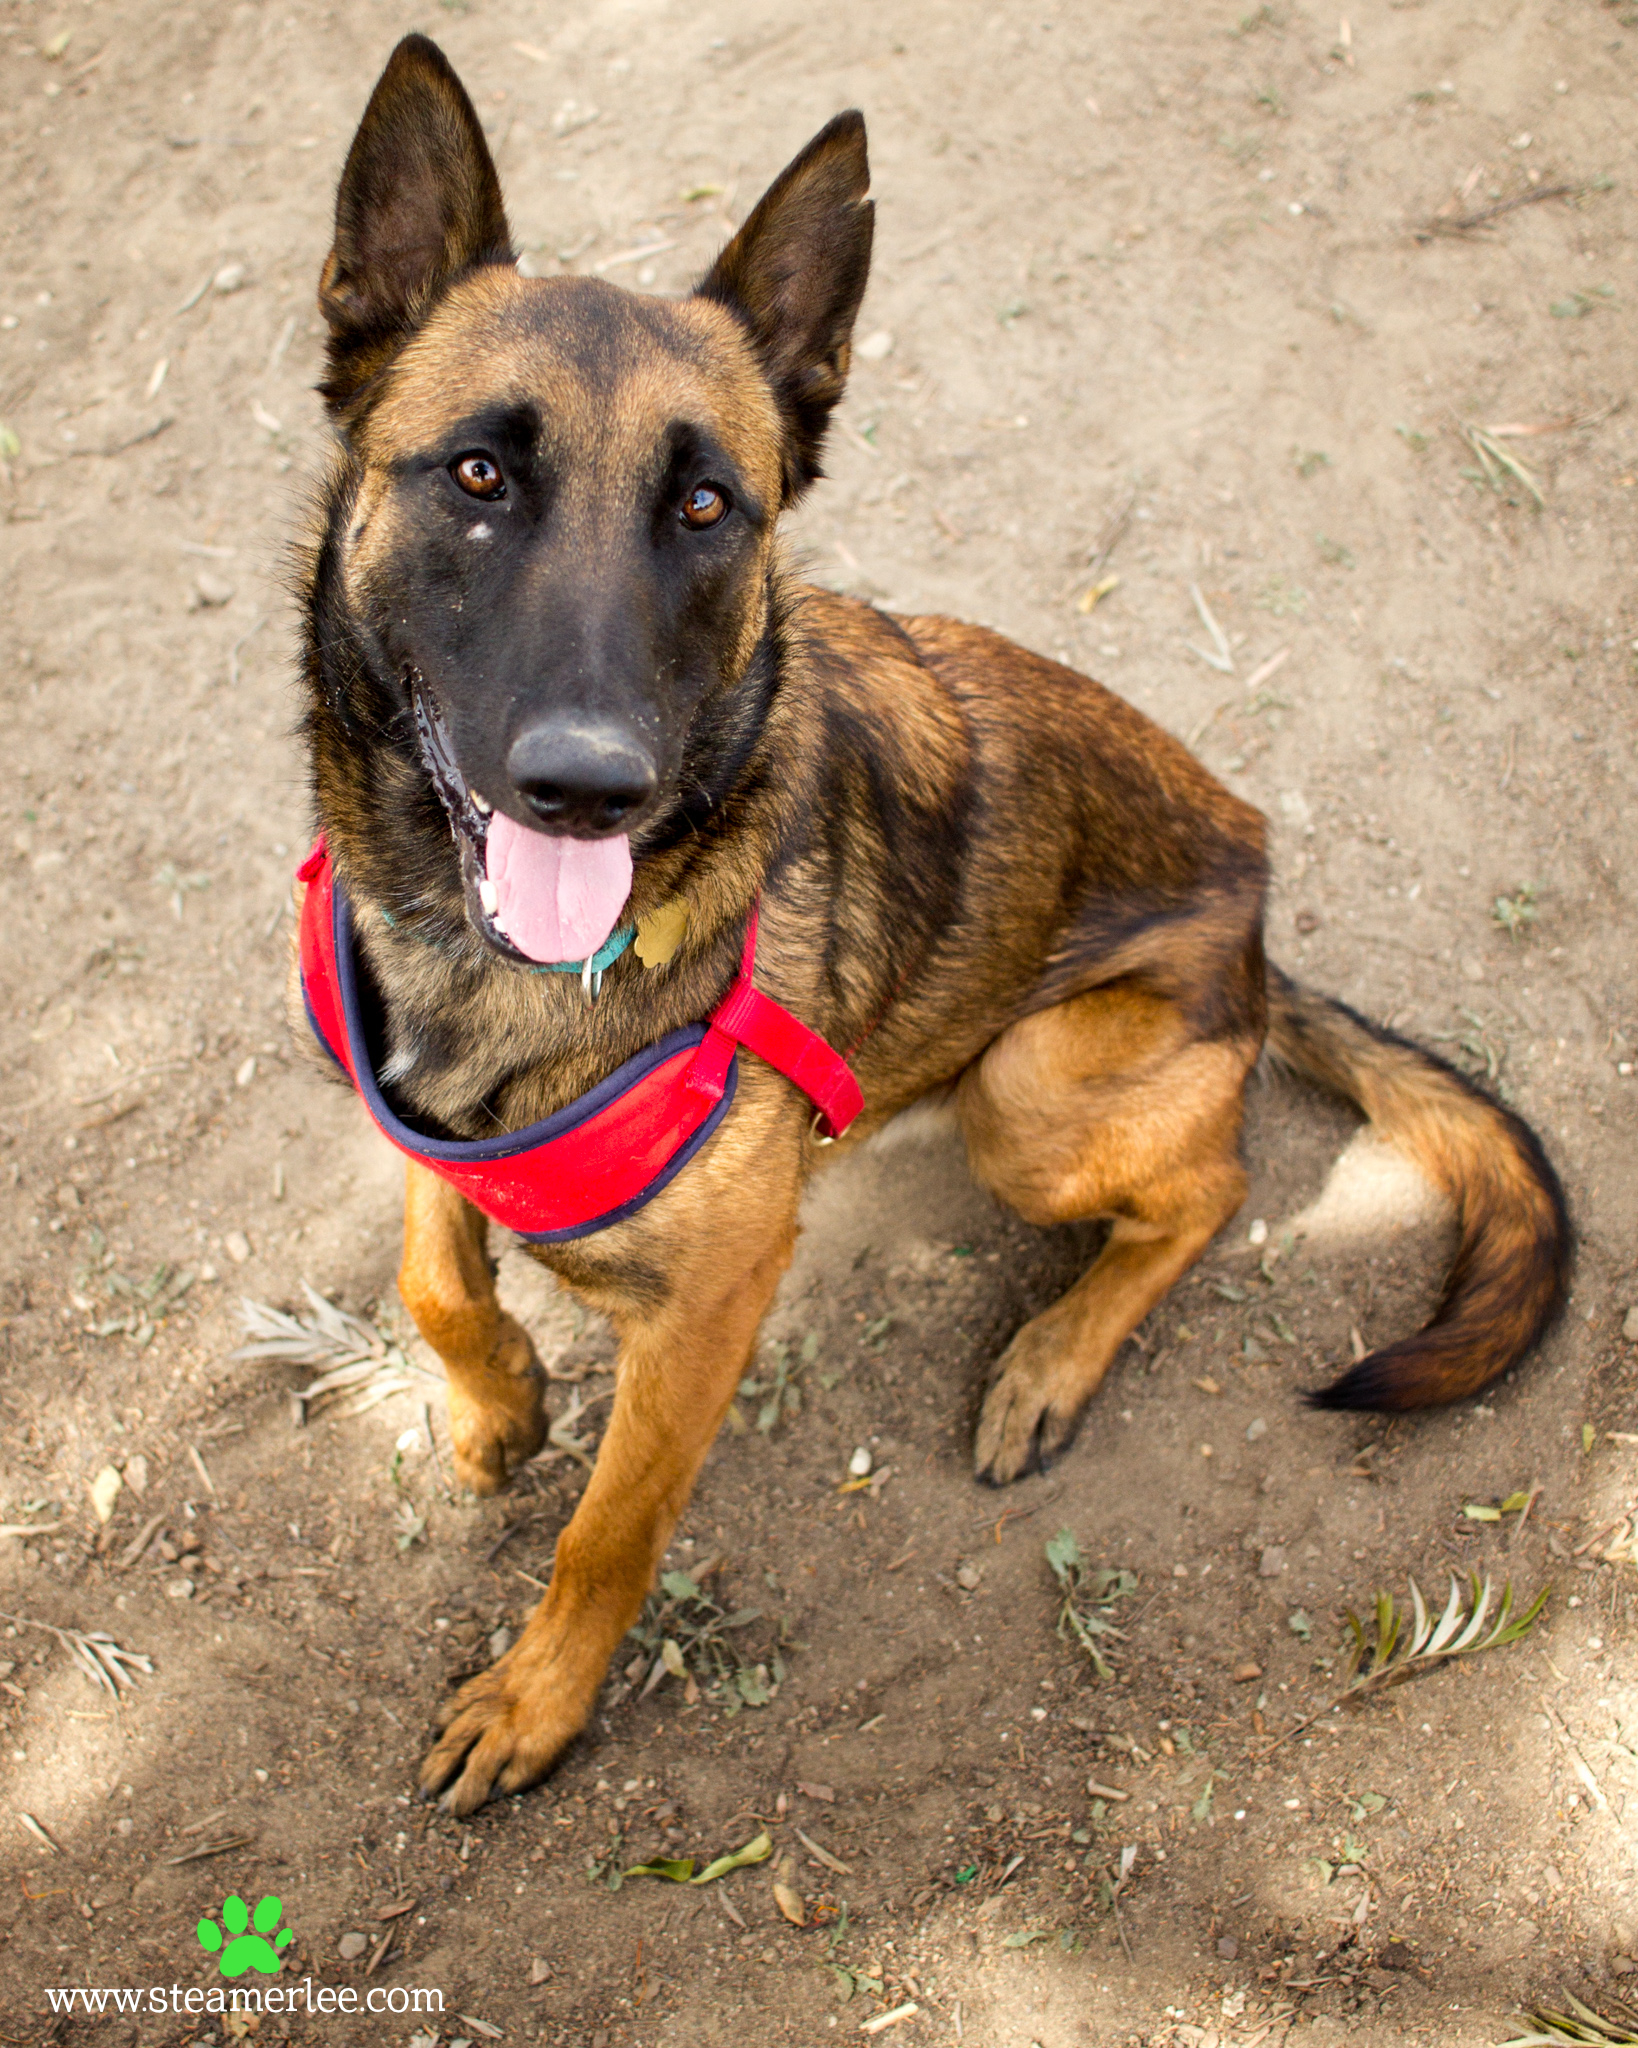 213 Orange County Dog Photography - Steamer Lee - Southern California.JPG